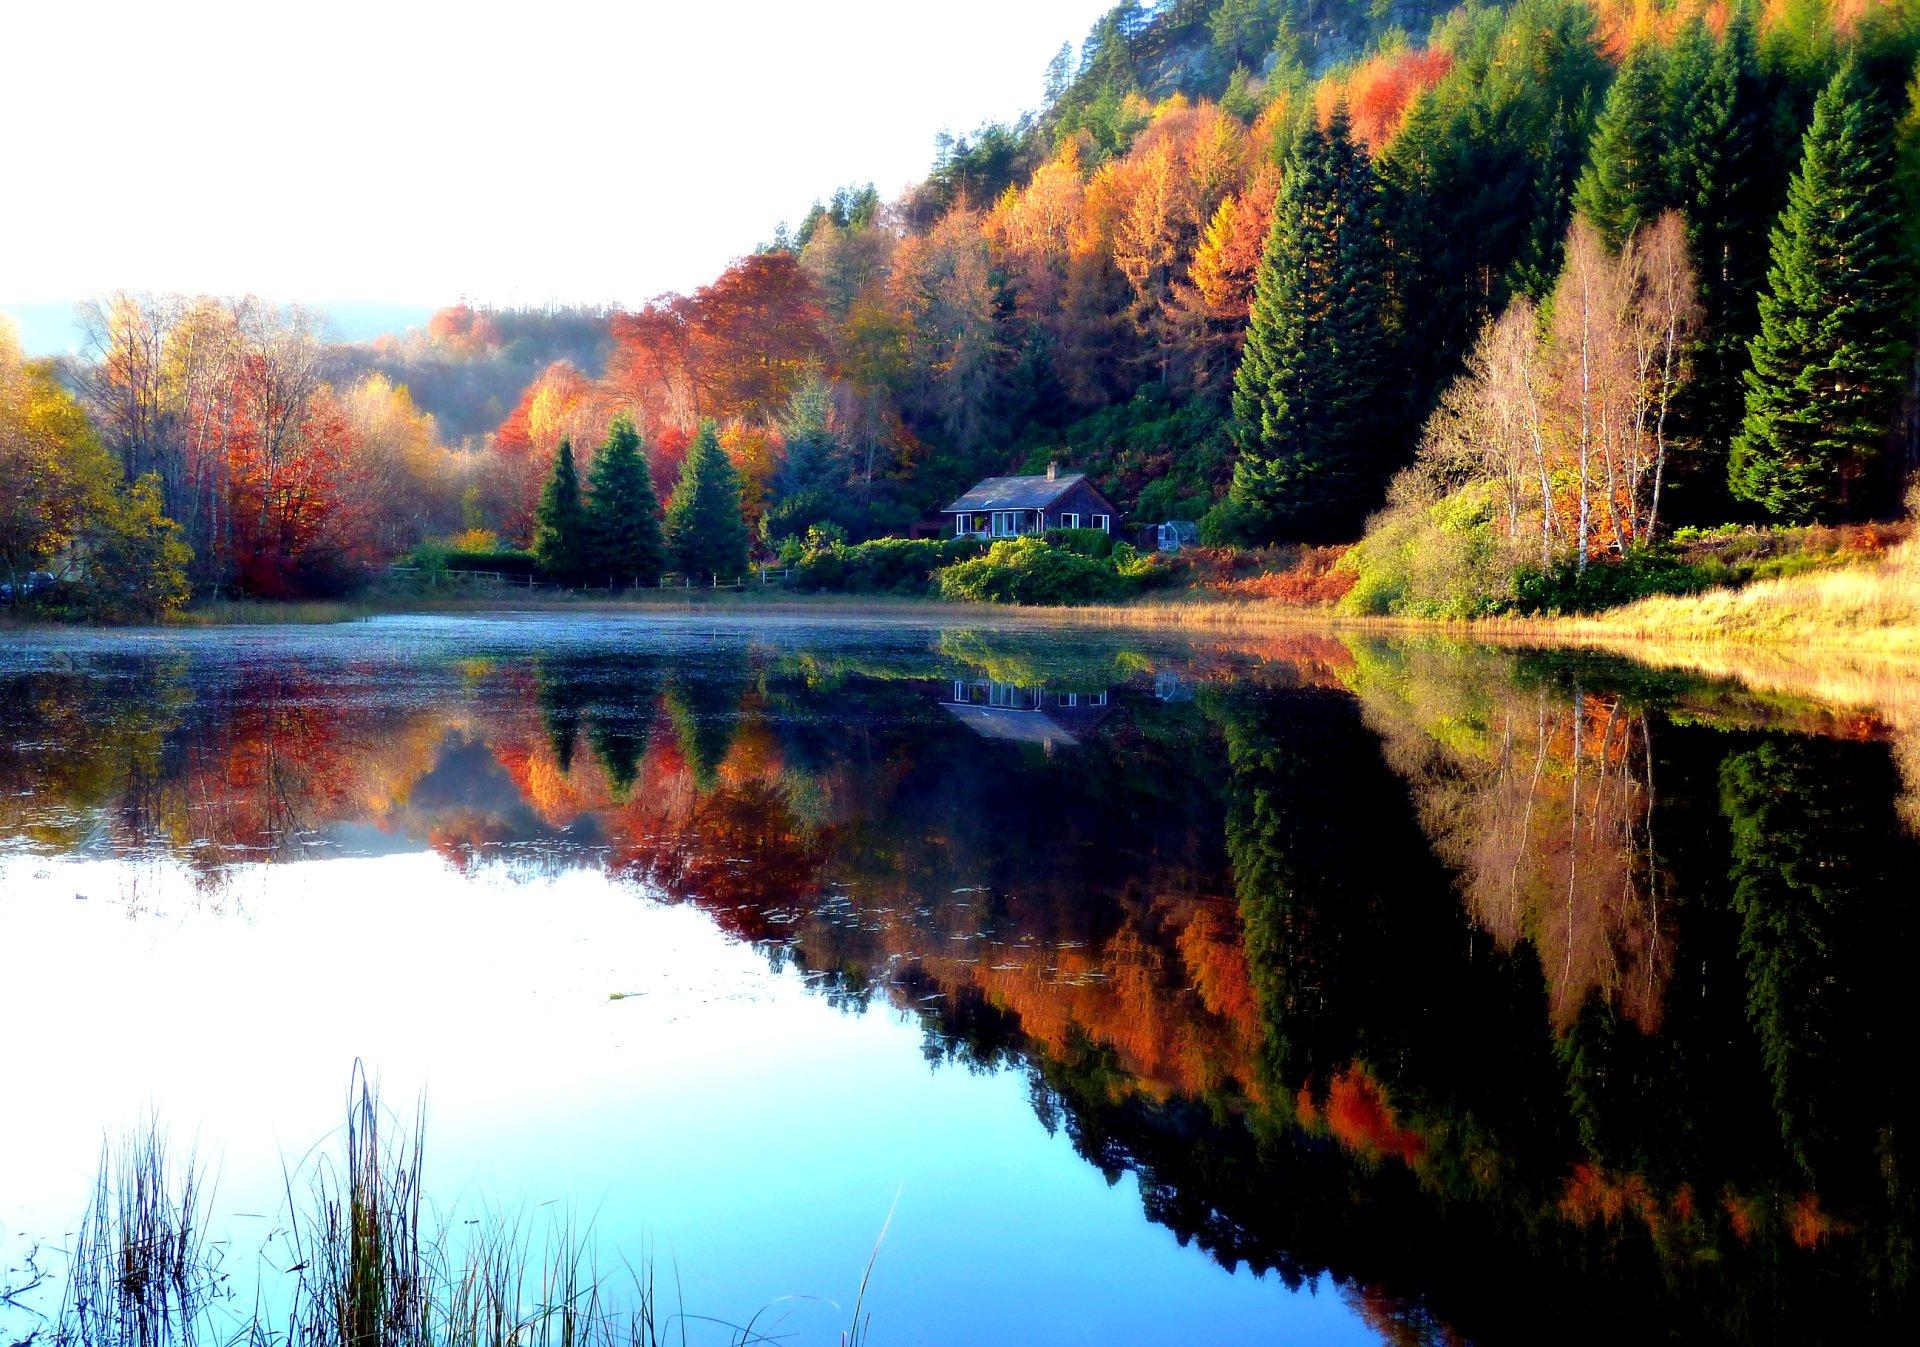 Fall HD Wallpaper | Background Image | 2597x1822 | ID ...